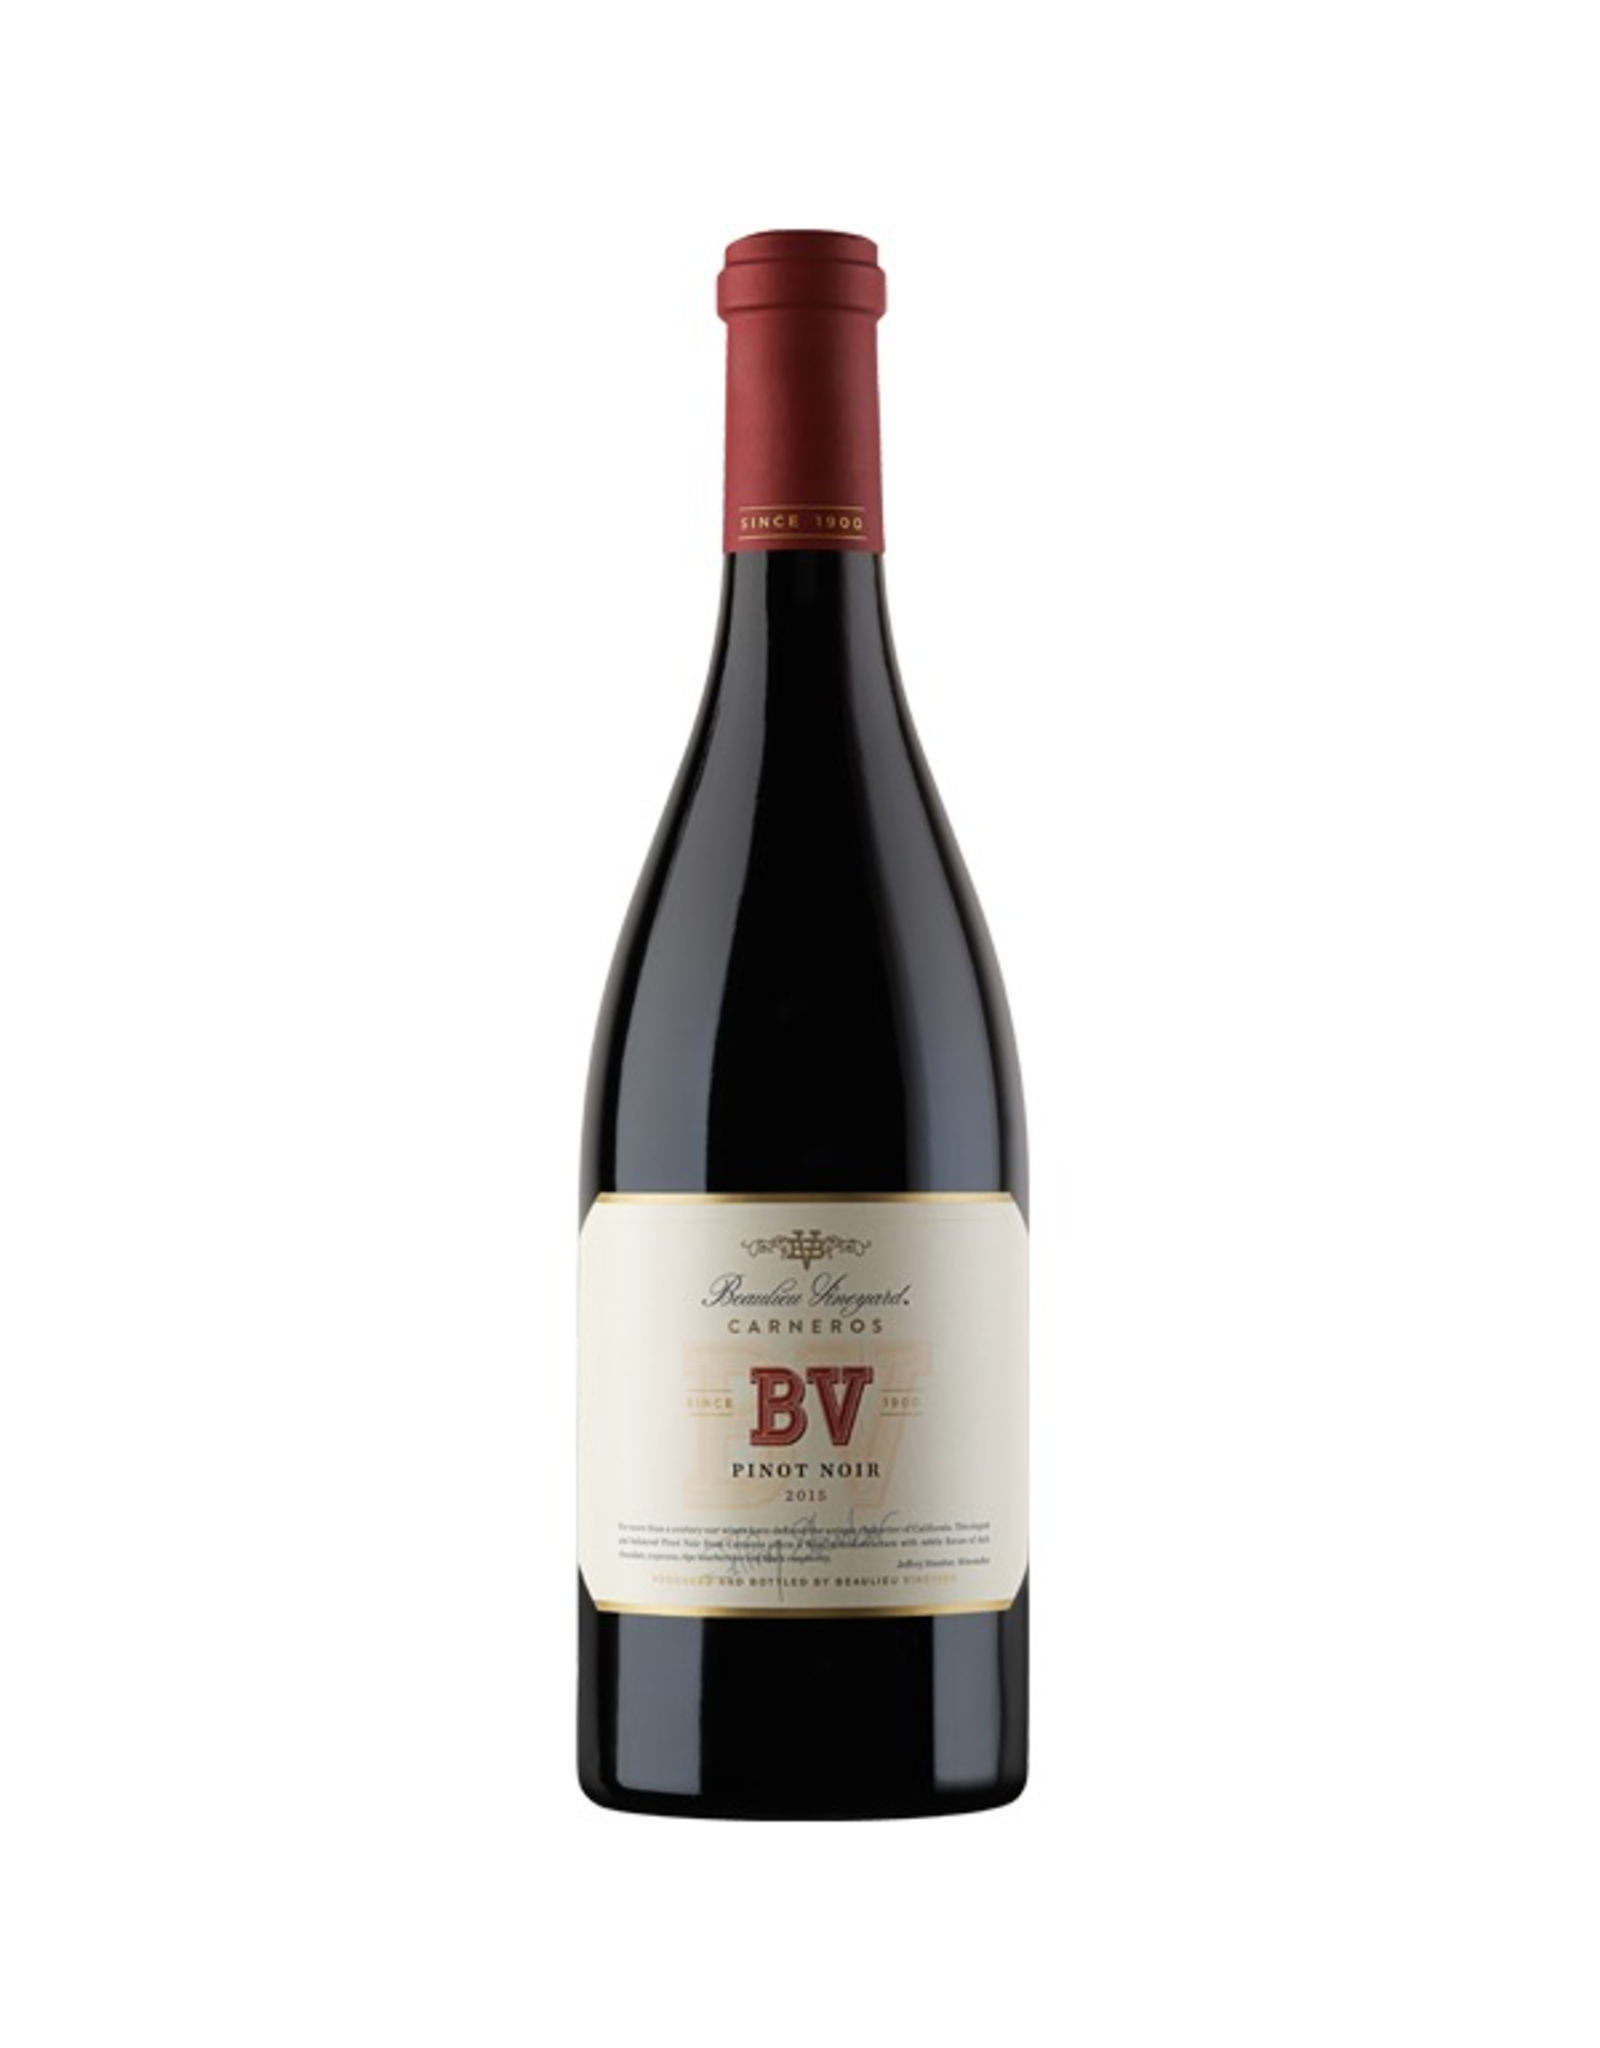 Red Wine 2016, BV Beaulieu Vineyards, Pinot Noir, Carneros, Napa Valley, California, 14.3% Alc, CTnr, TW92